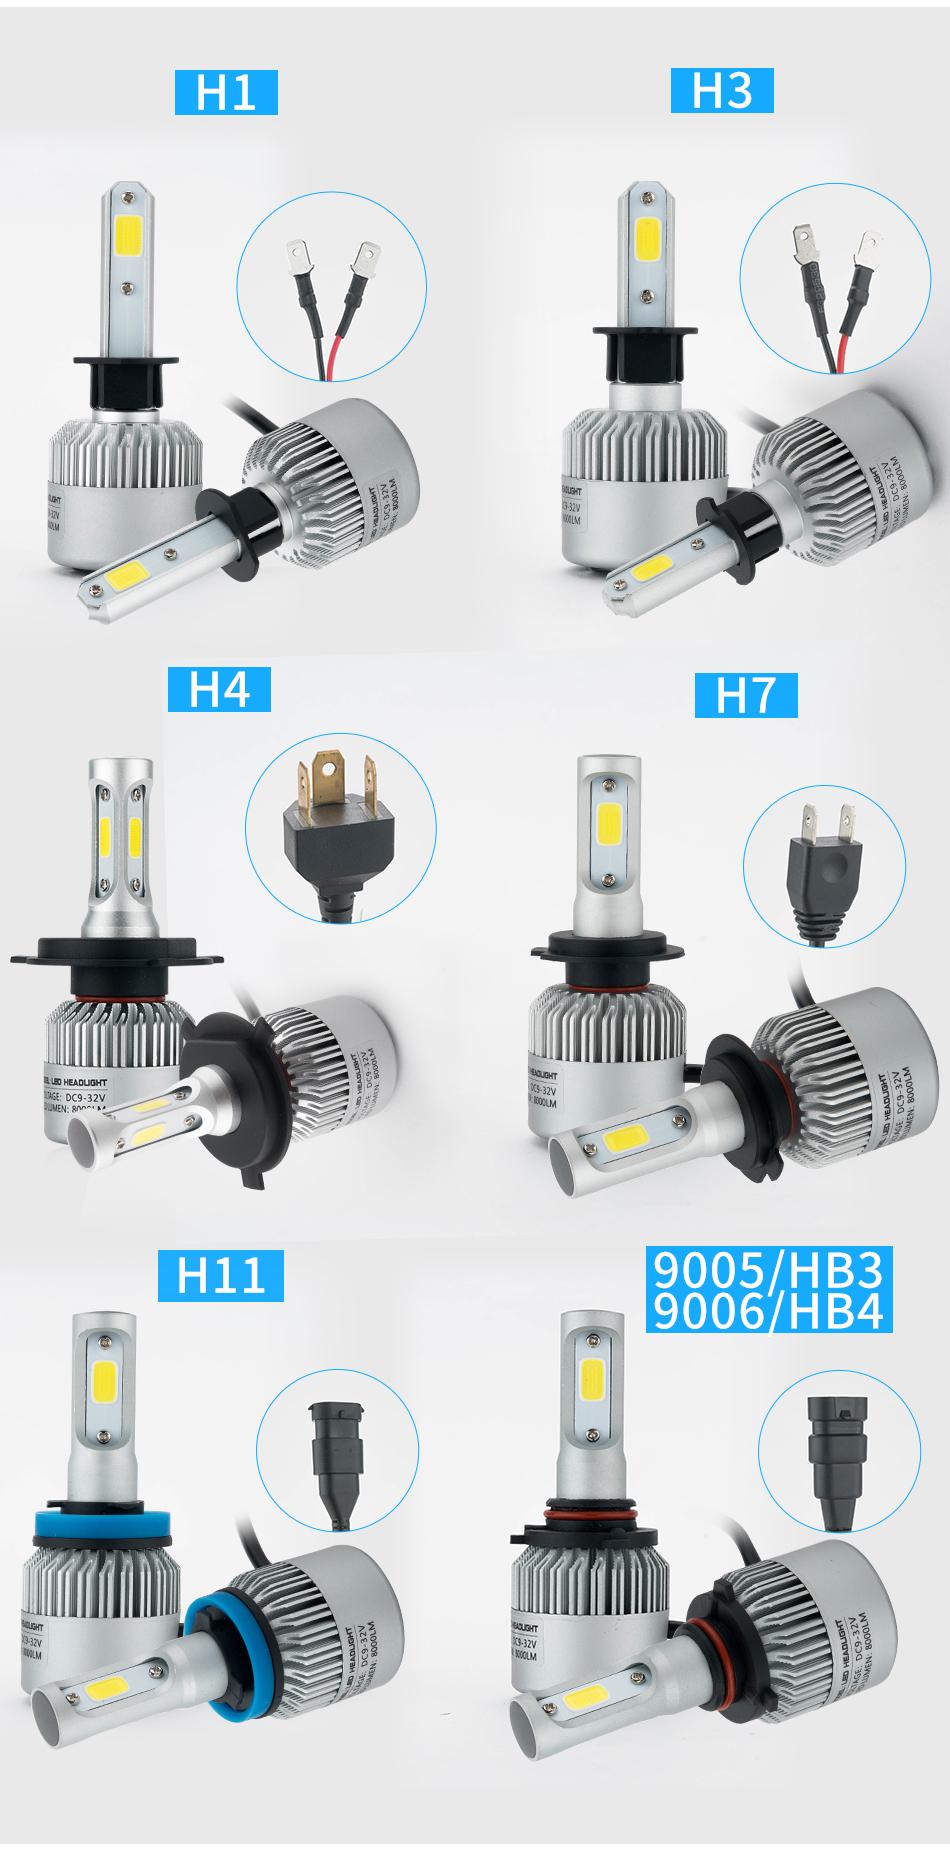 h1 h7 led scheinwerfer birnen headlight leuchte lampen headlight paar 100w ebay. Black Bedroom Furniture Sets. Home Design Ideas